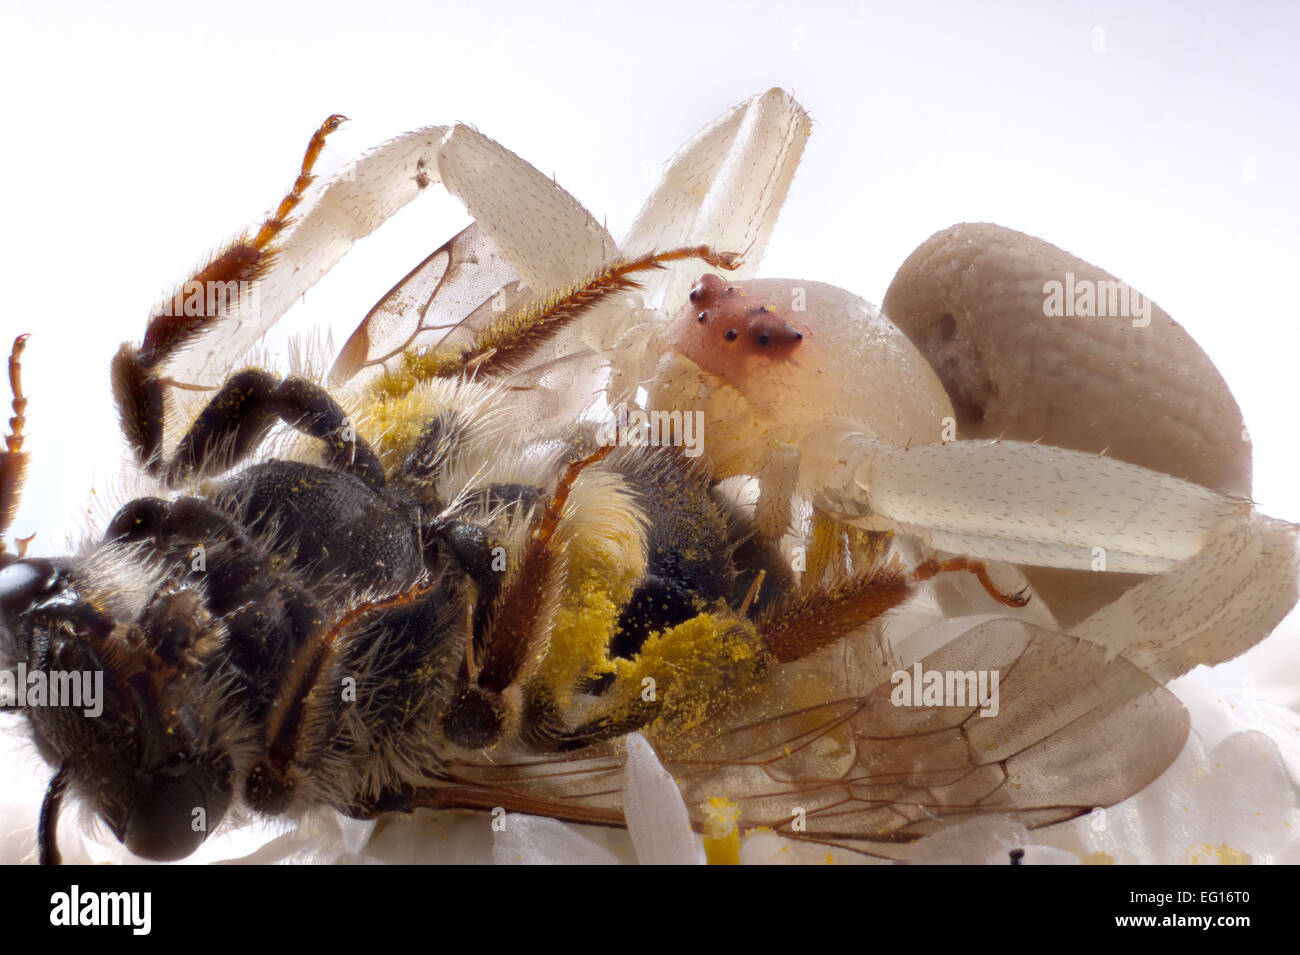 bnexbc-crab-spider-misumena-vatia-feedin